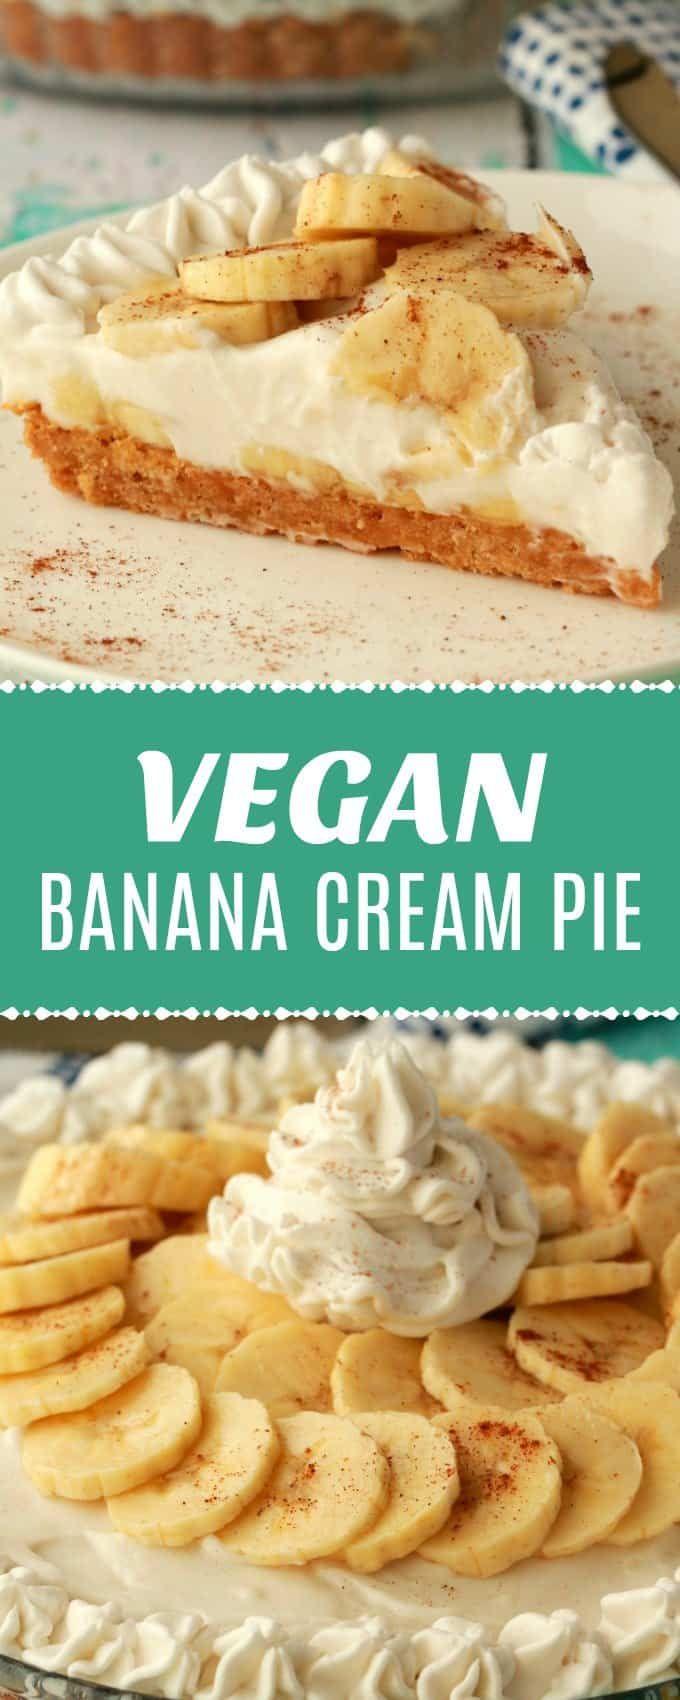 Deliciously creamy vegan banana cream pie. A golden oreo cookie crust topped with layers of sliced banana, creamy pudding and whipped vegan cream! #vegan #dairyfree | lovingitvegan.com #desertlife